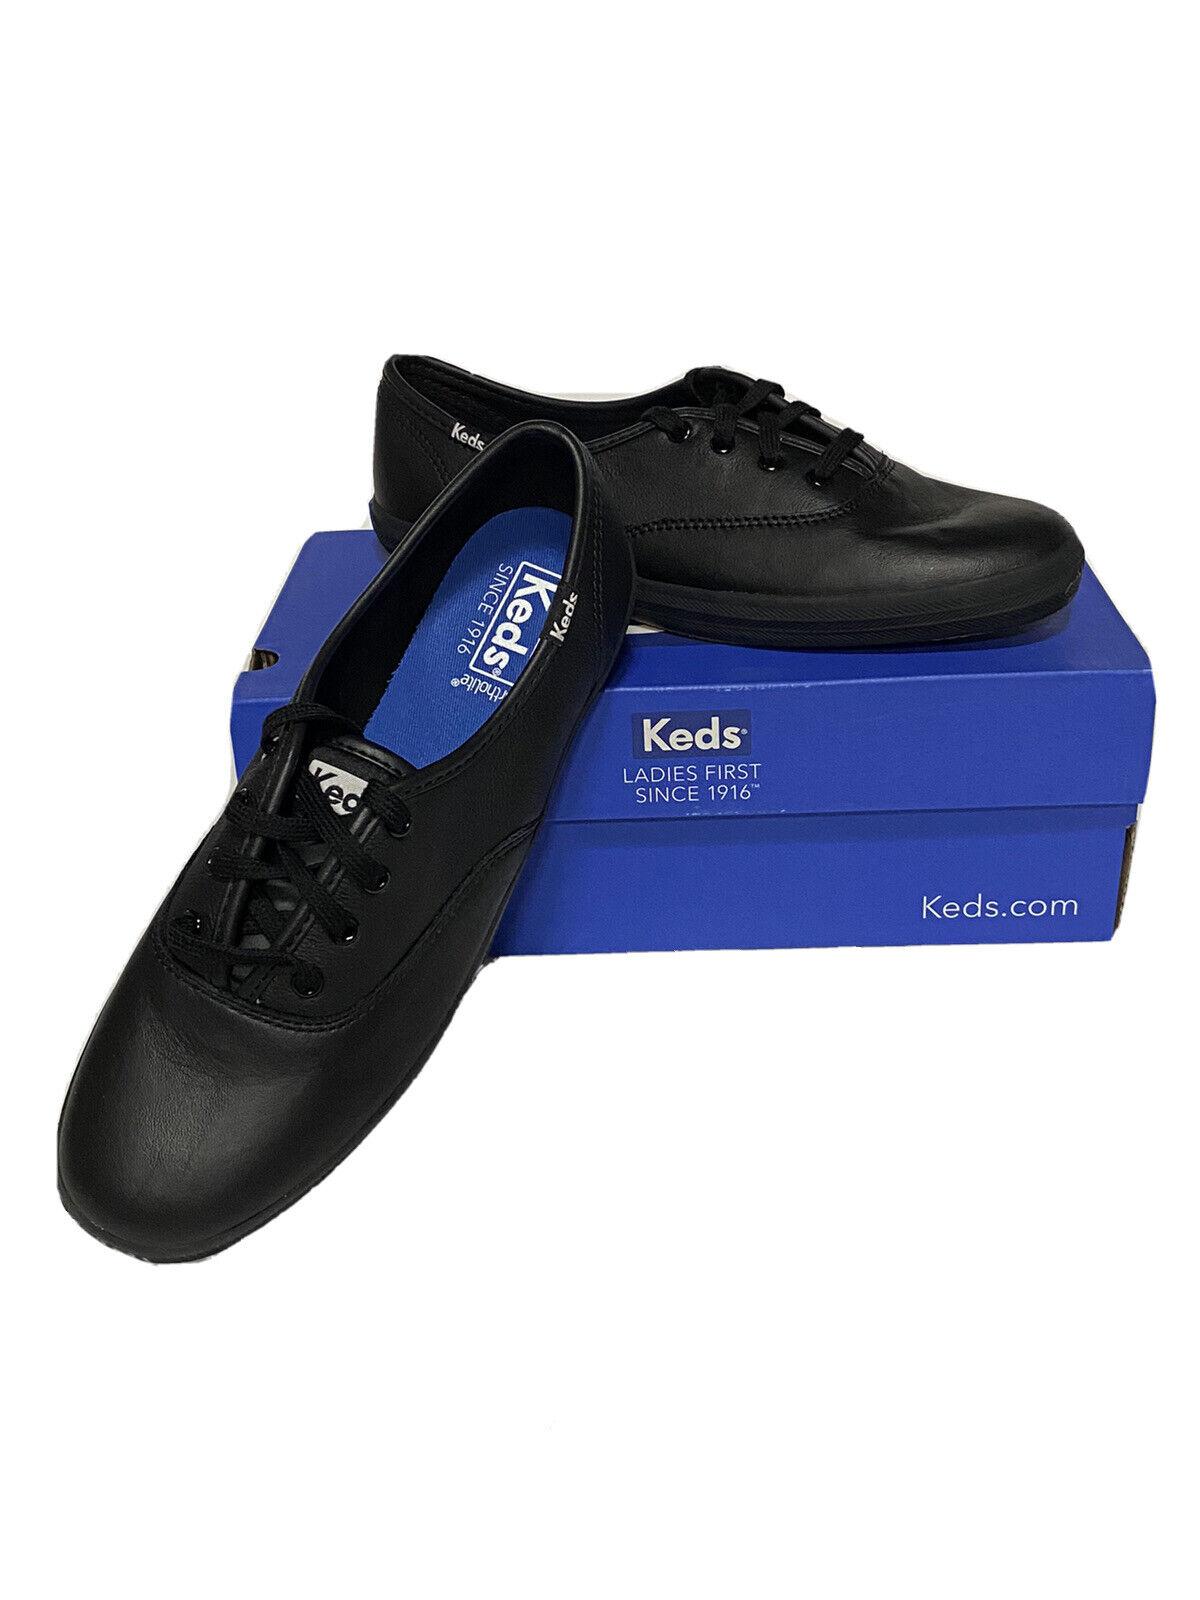 Keds Ortholite Champion Oxford Leather Shoes Womens Sz 7.5 M Black NEW NIB